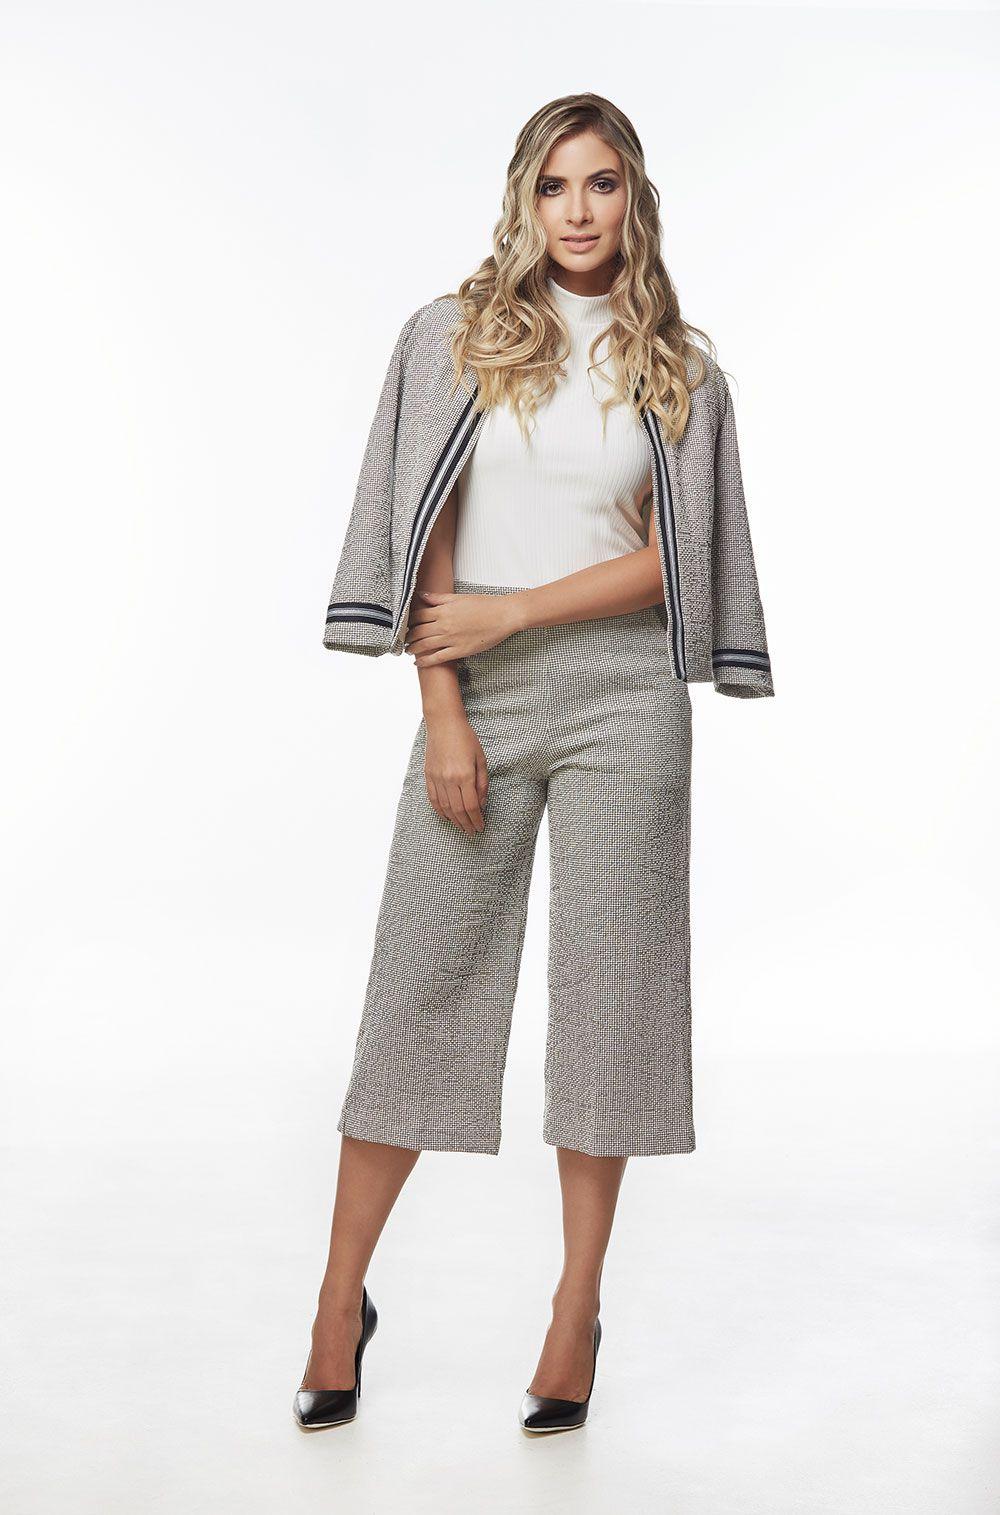 efbb2b775 Conjunto Blazer e Calça Pantacurt - VANKOKE - Moda Feminina ...